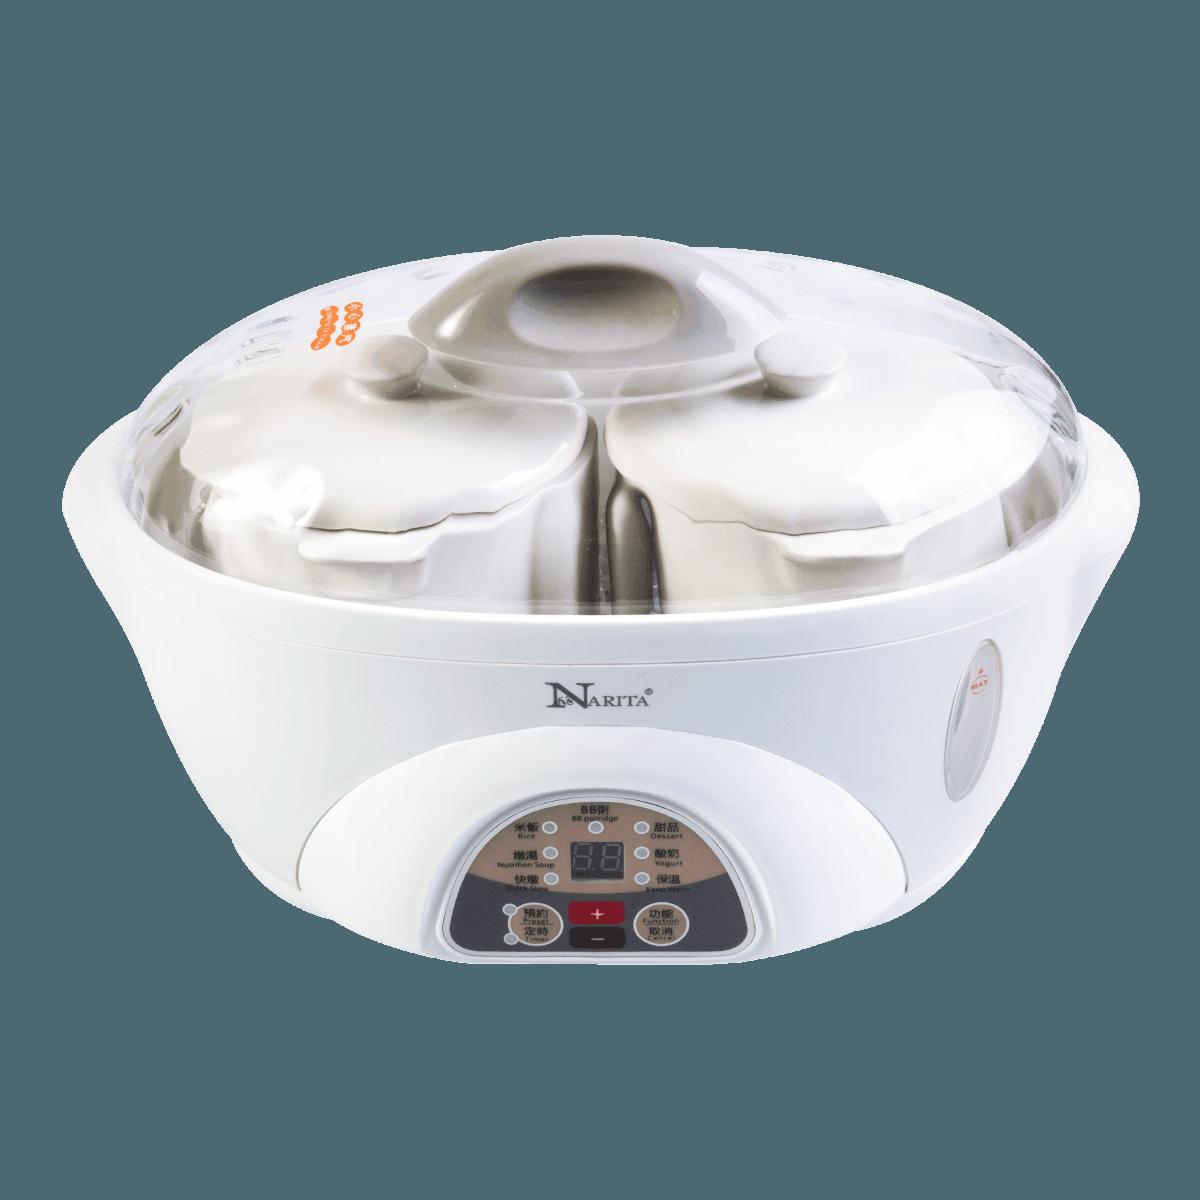 Yamibuy.com:Customer reviews:NARITA Multi Function Ceramic Pot Electric Stew Pot Slow Cooker 1.5L*1+0.5L*2 NSQ-165X